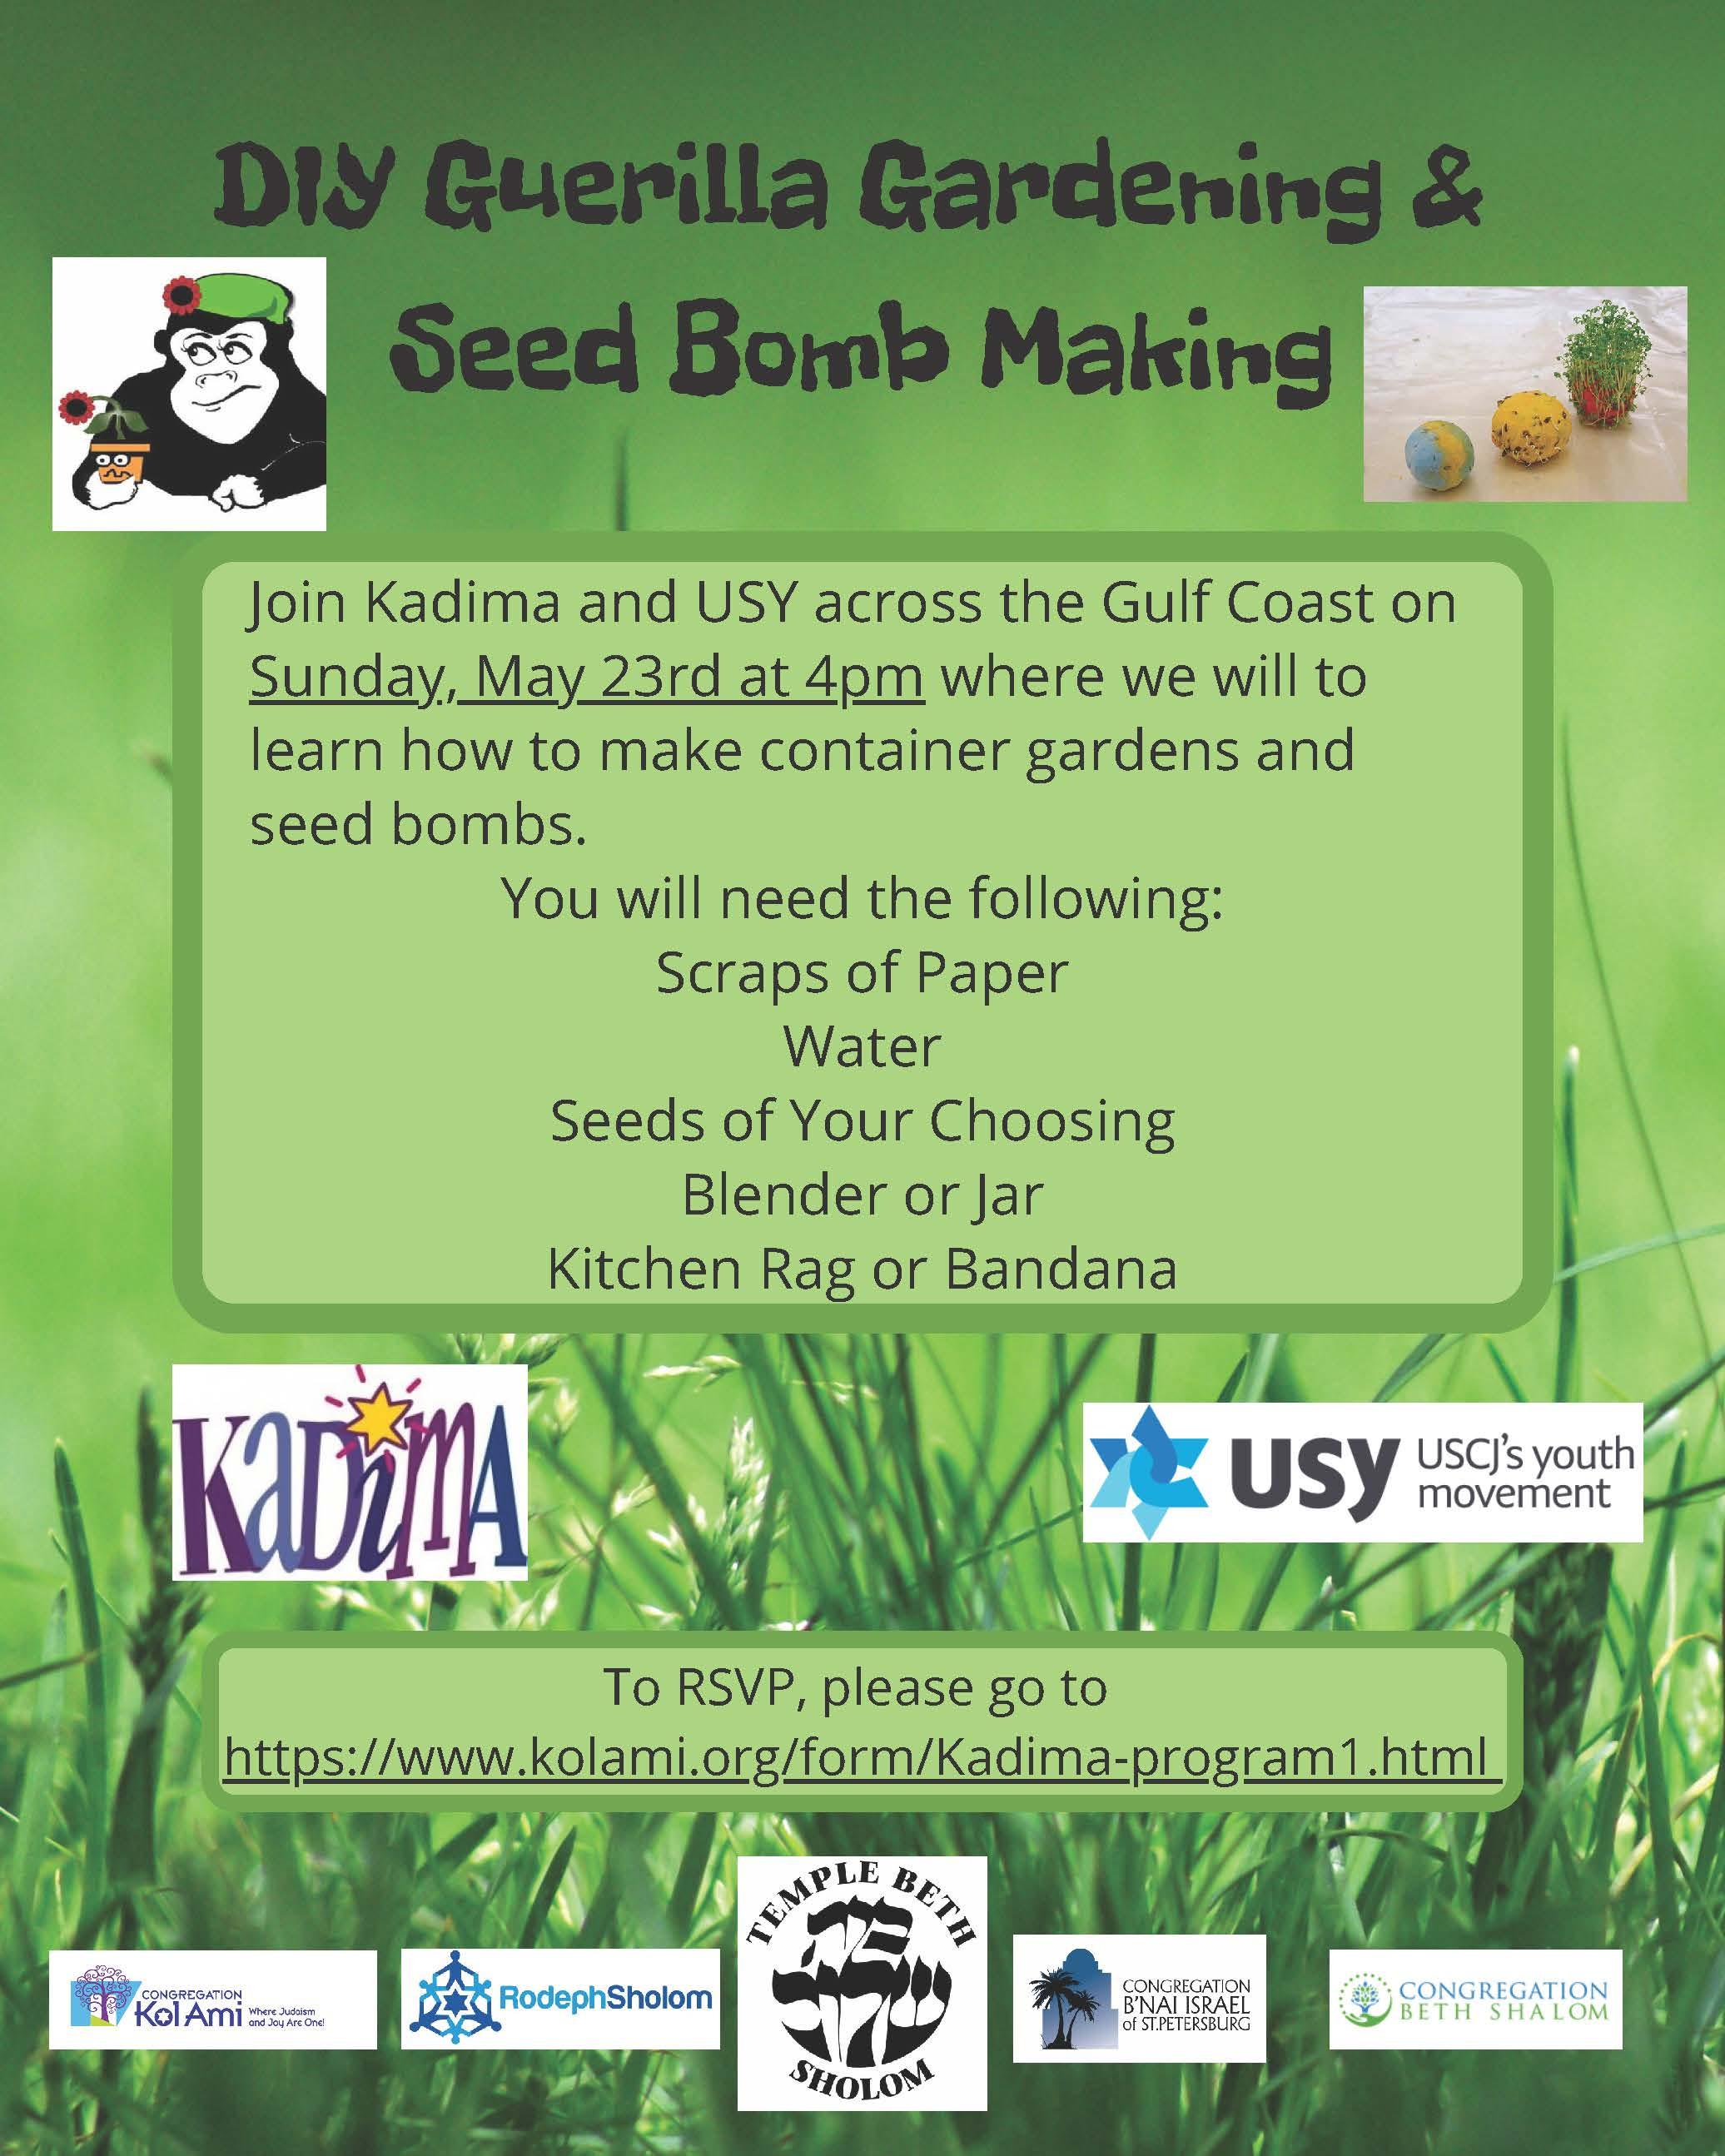 Banner Image for USY & Kadima: DIY Guerilla Gardening & Seed Bomb Making